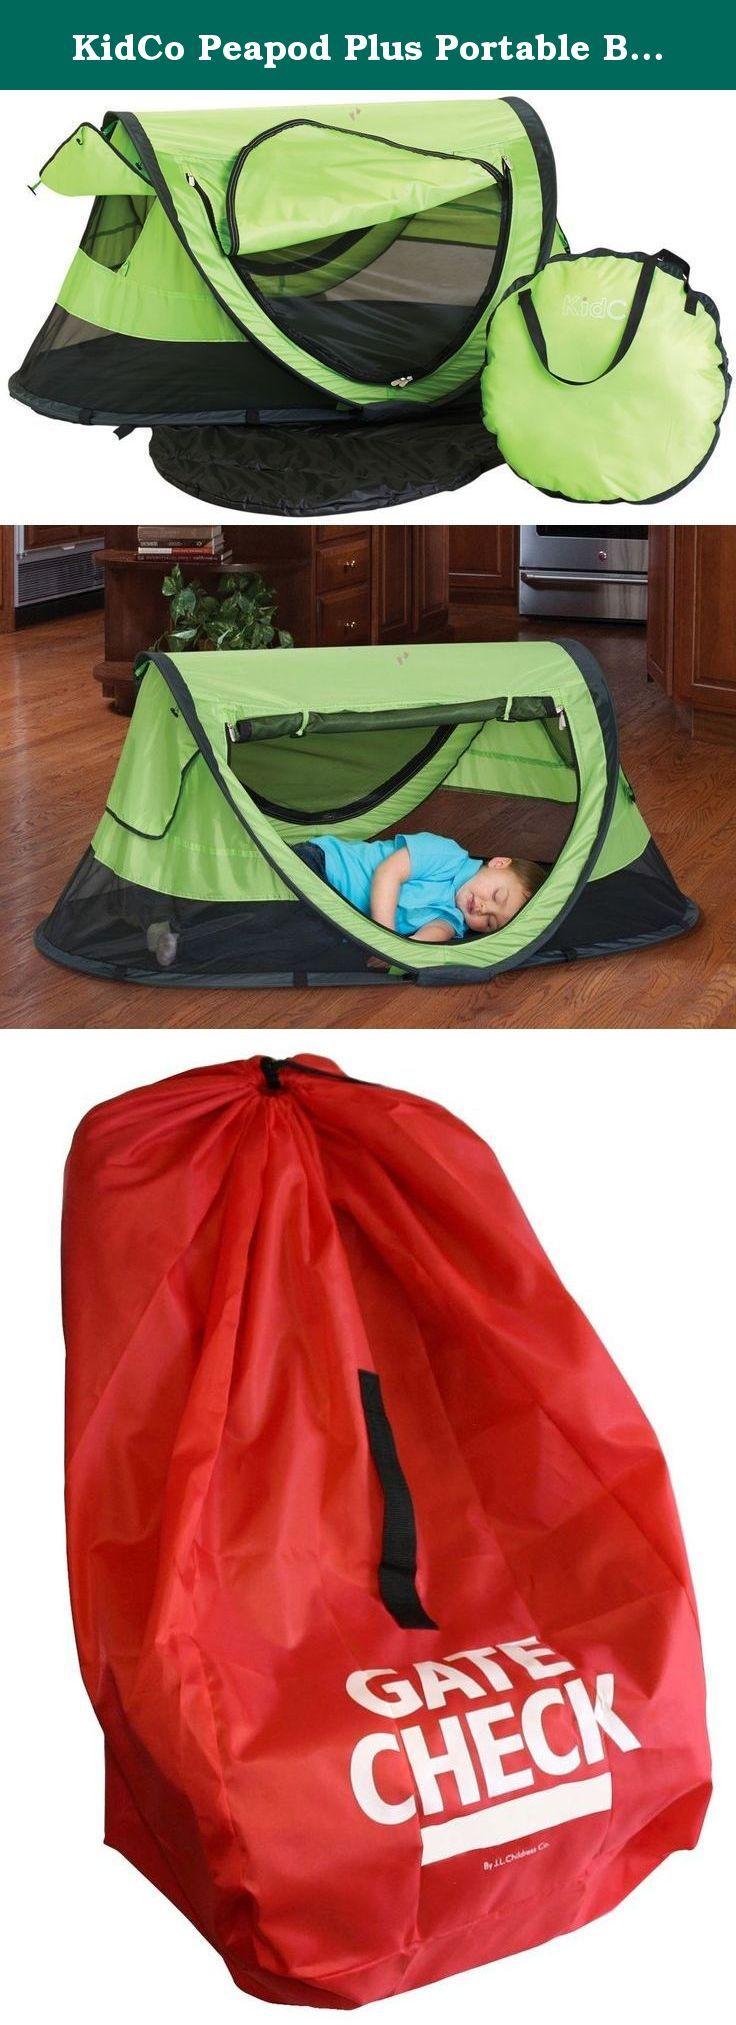 KidCo Peapod Plus Portable Bed with Bonus Gate Check Bag Kiwi. A bigger version & KidCo Peapod Plus Portable Bed with Bonus Gate Check Bag Kiwi. A ...